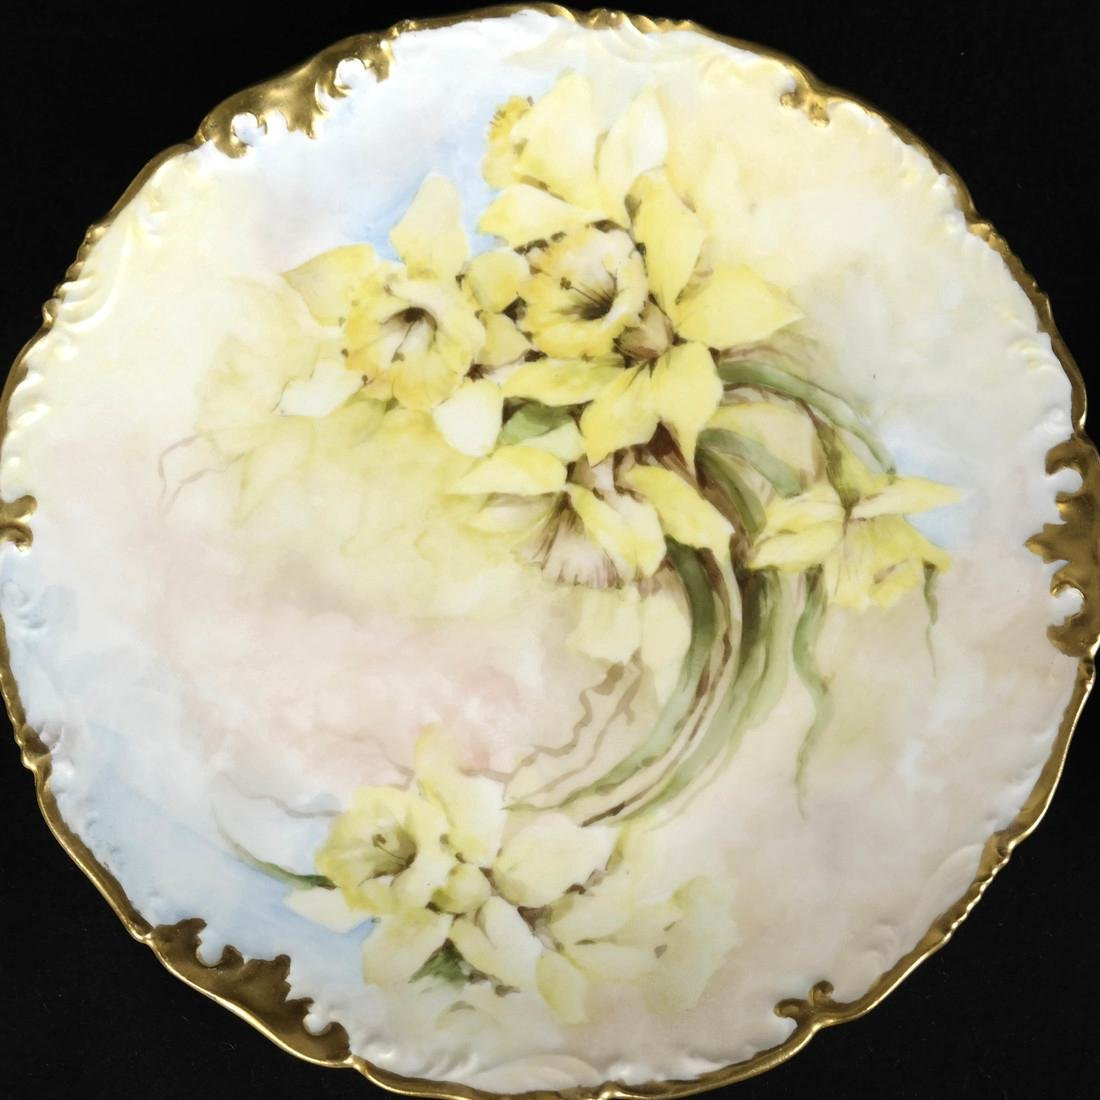 Pair of Limoges Porcelain Plates - 3